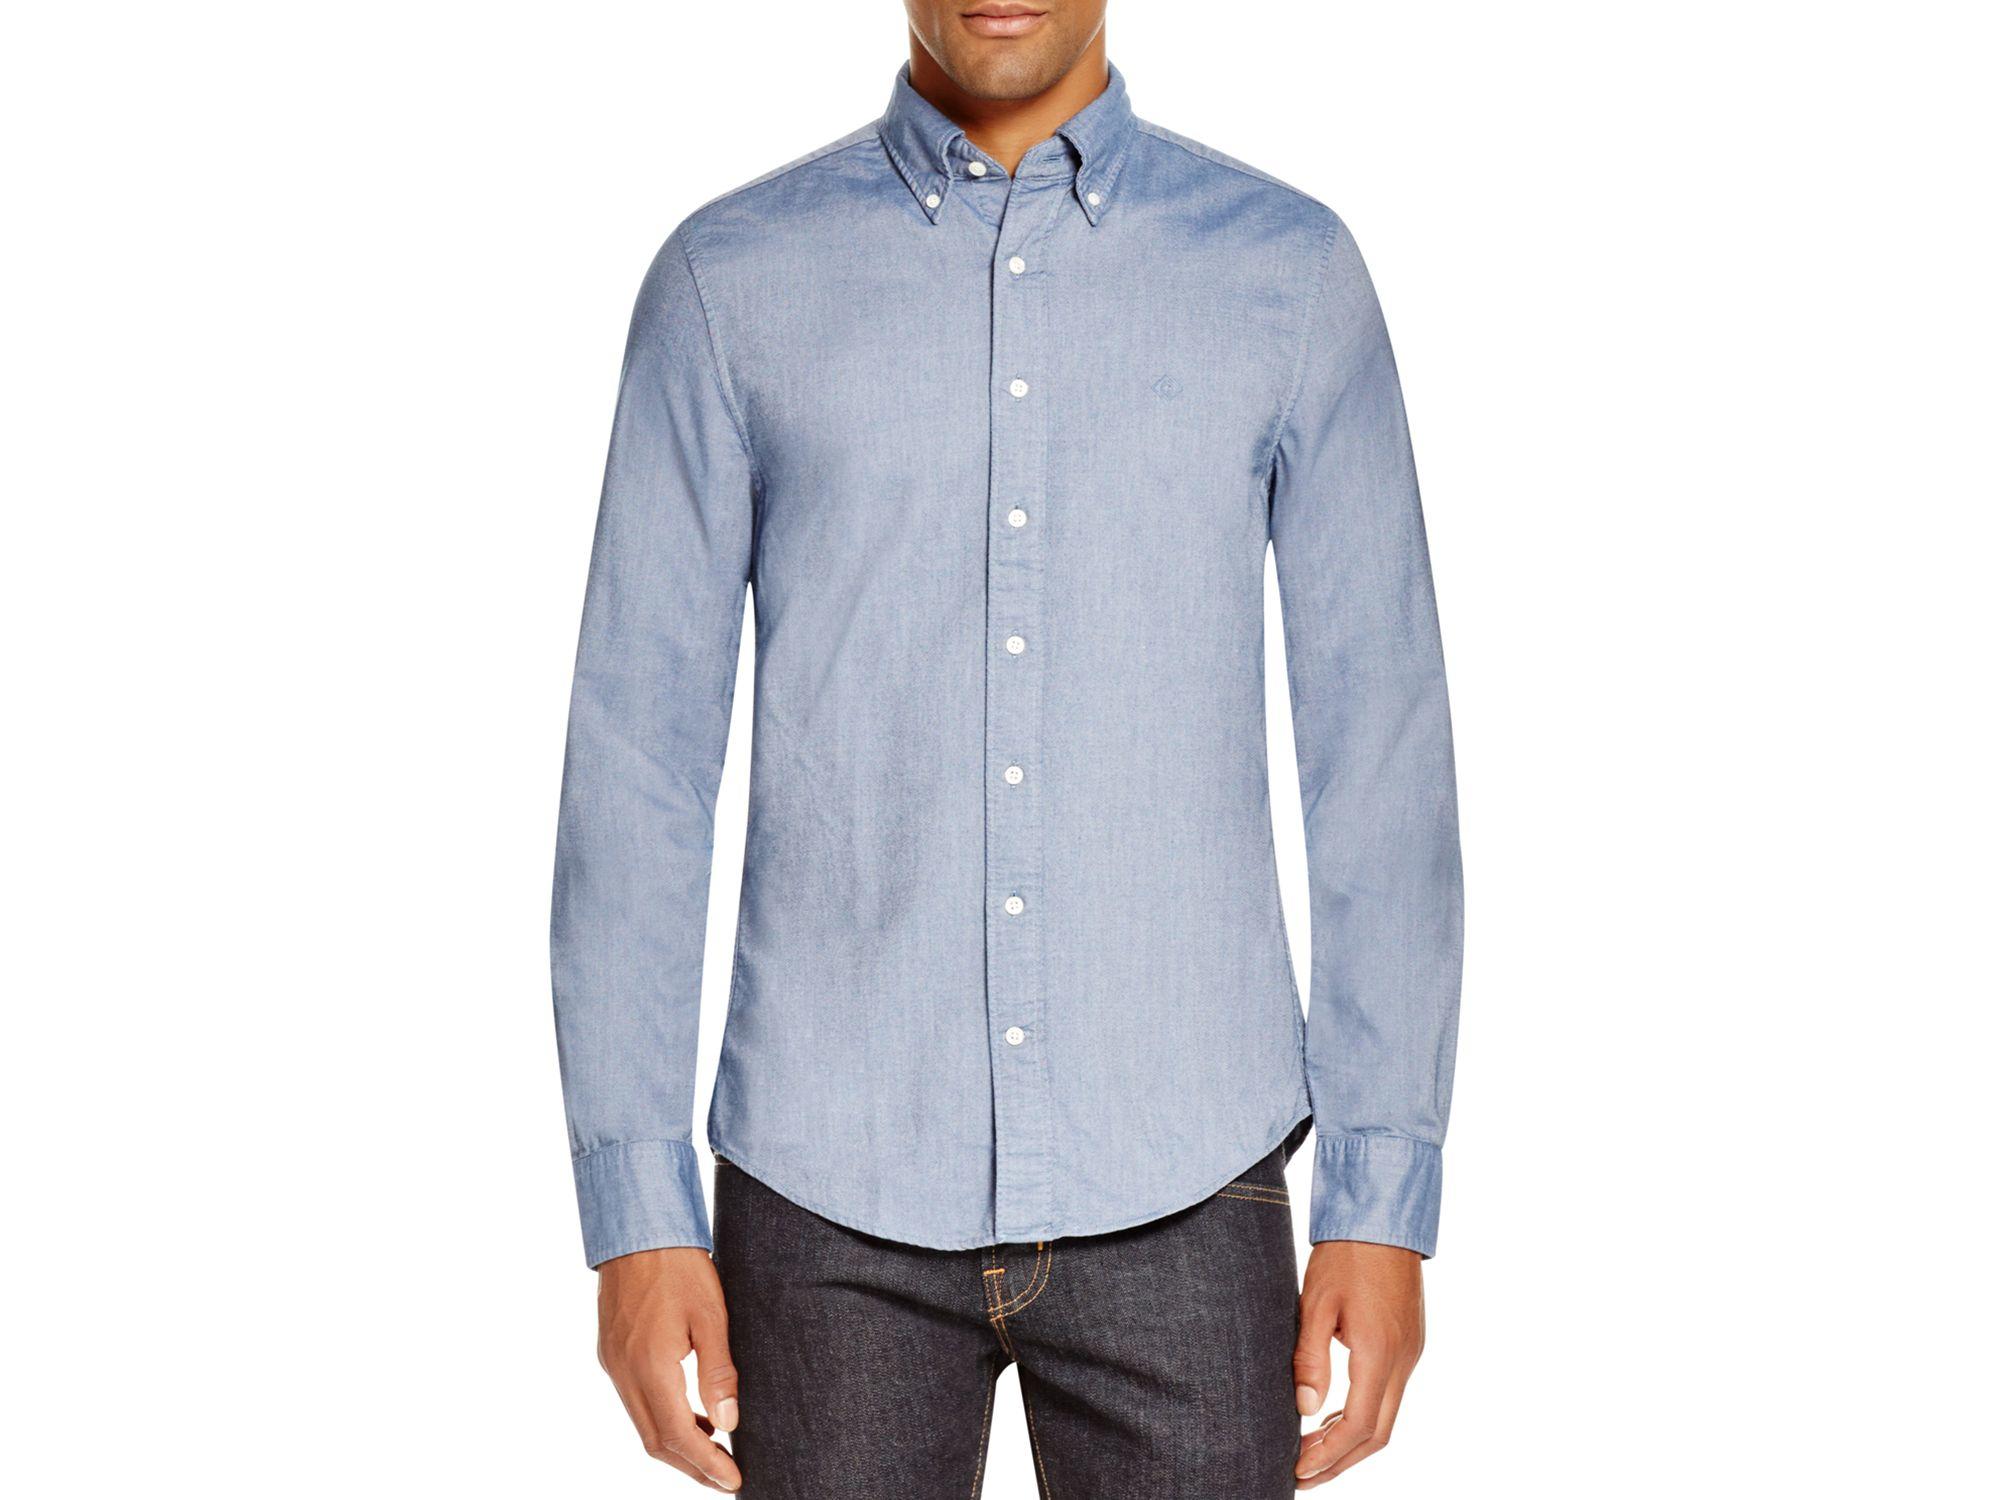 Lyst gant perfect oxford slim fit button down shirt in for Slim fit white button down shirt